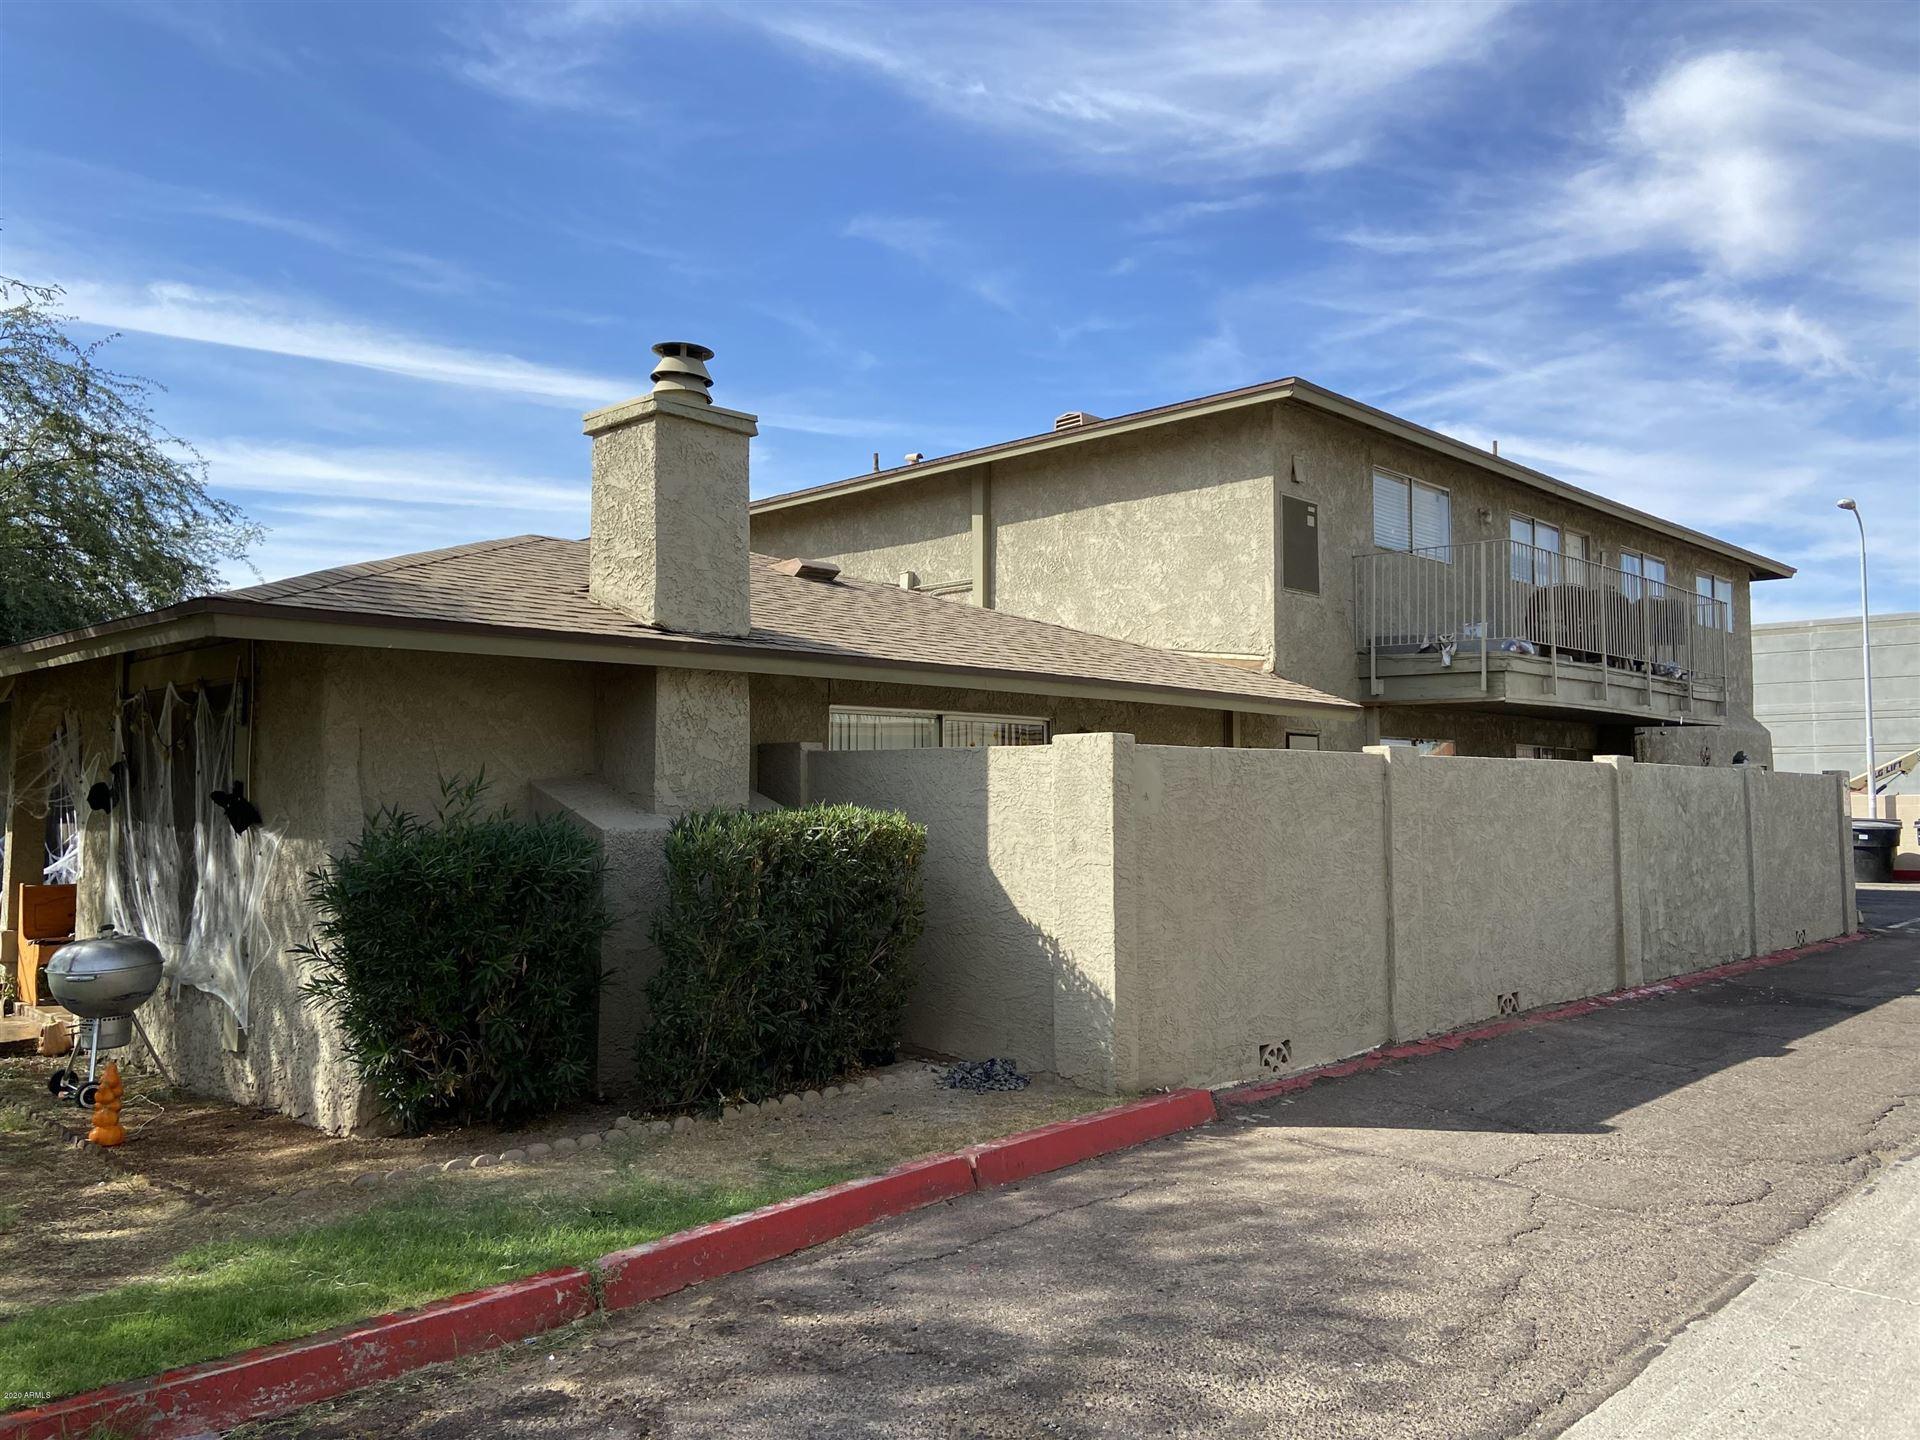 3316 W LOMA Lane, Phoenix, AZ 85051 - MLS#: 6146669